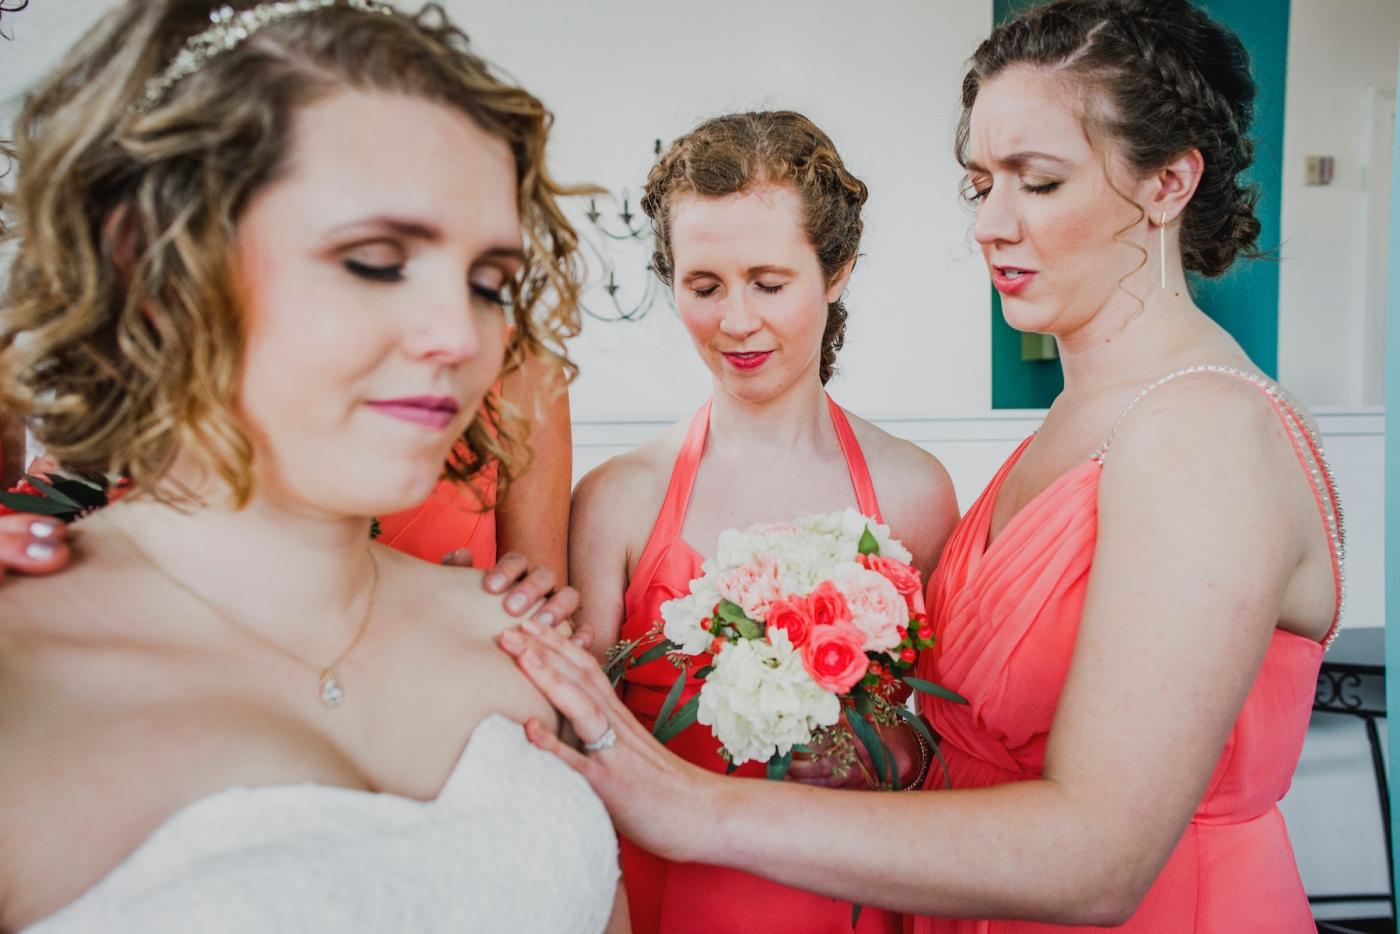 DSC_2468Everett_Wedding_Ballroom_Jane_Speleers_photography_Rachel_and_Edmund_Praying_2017